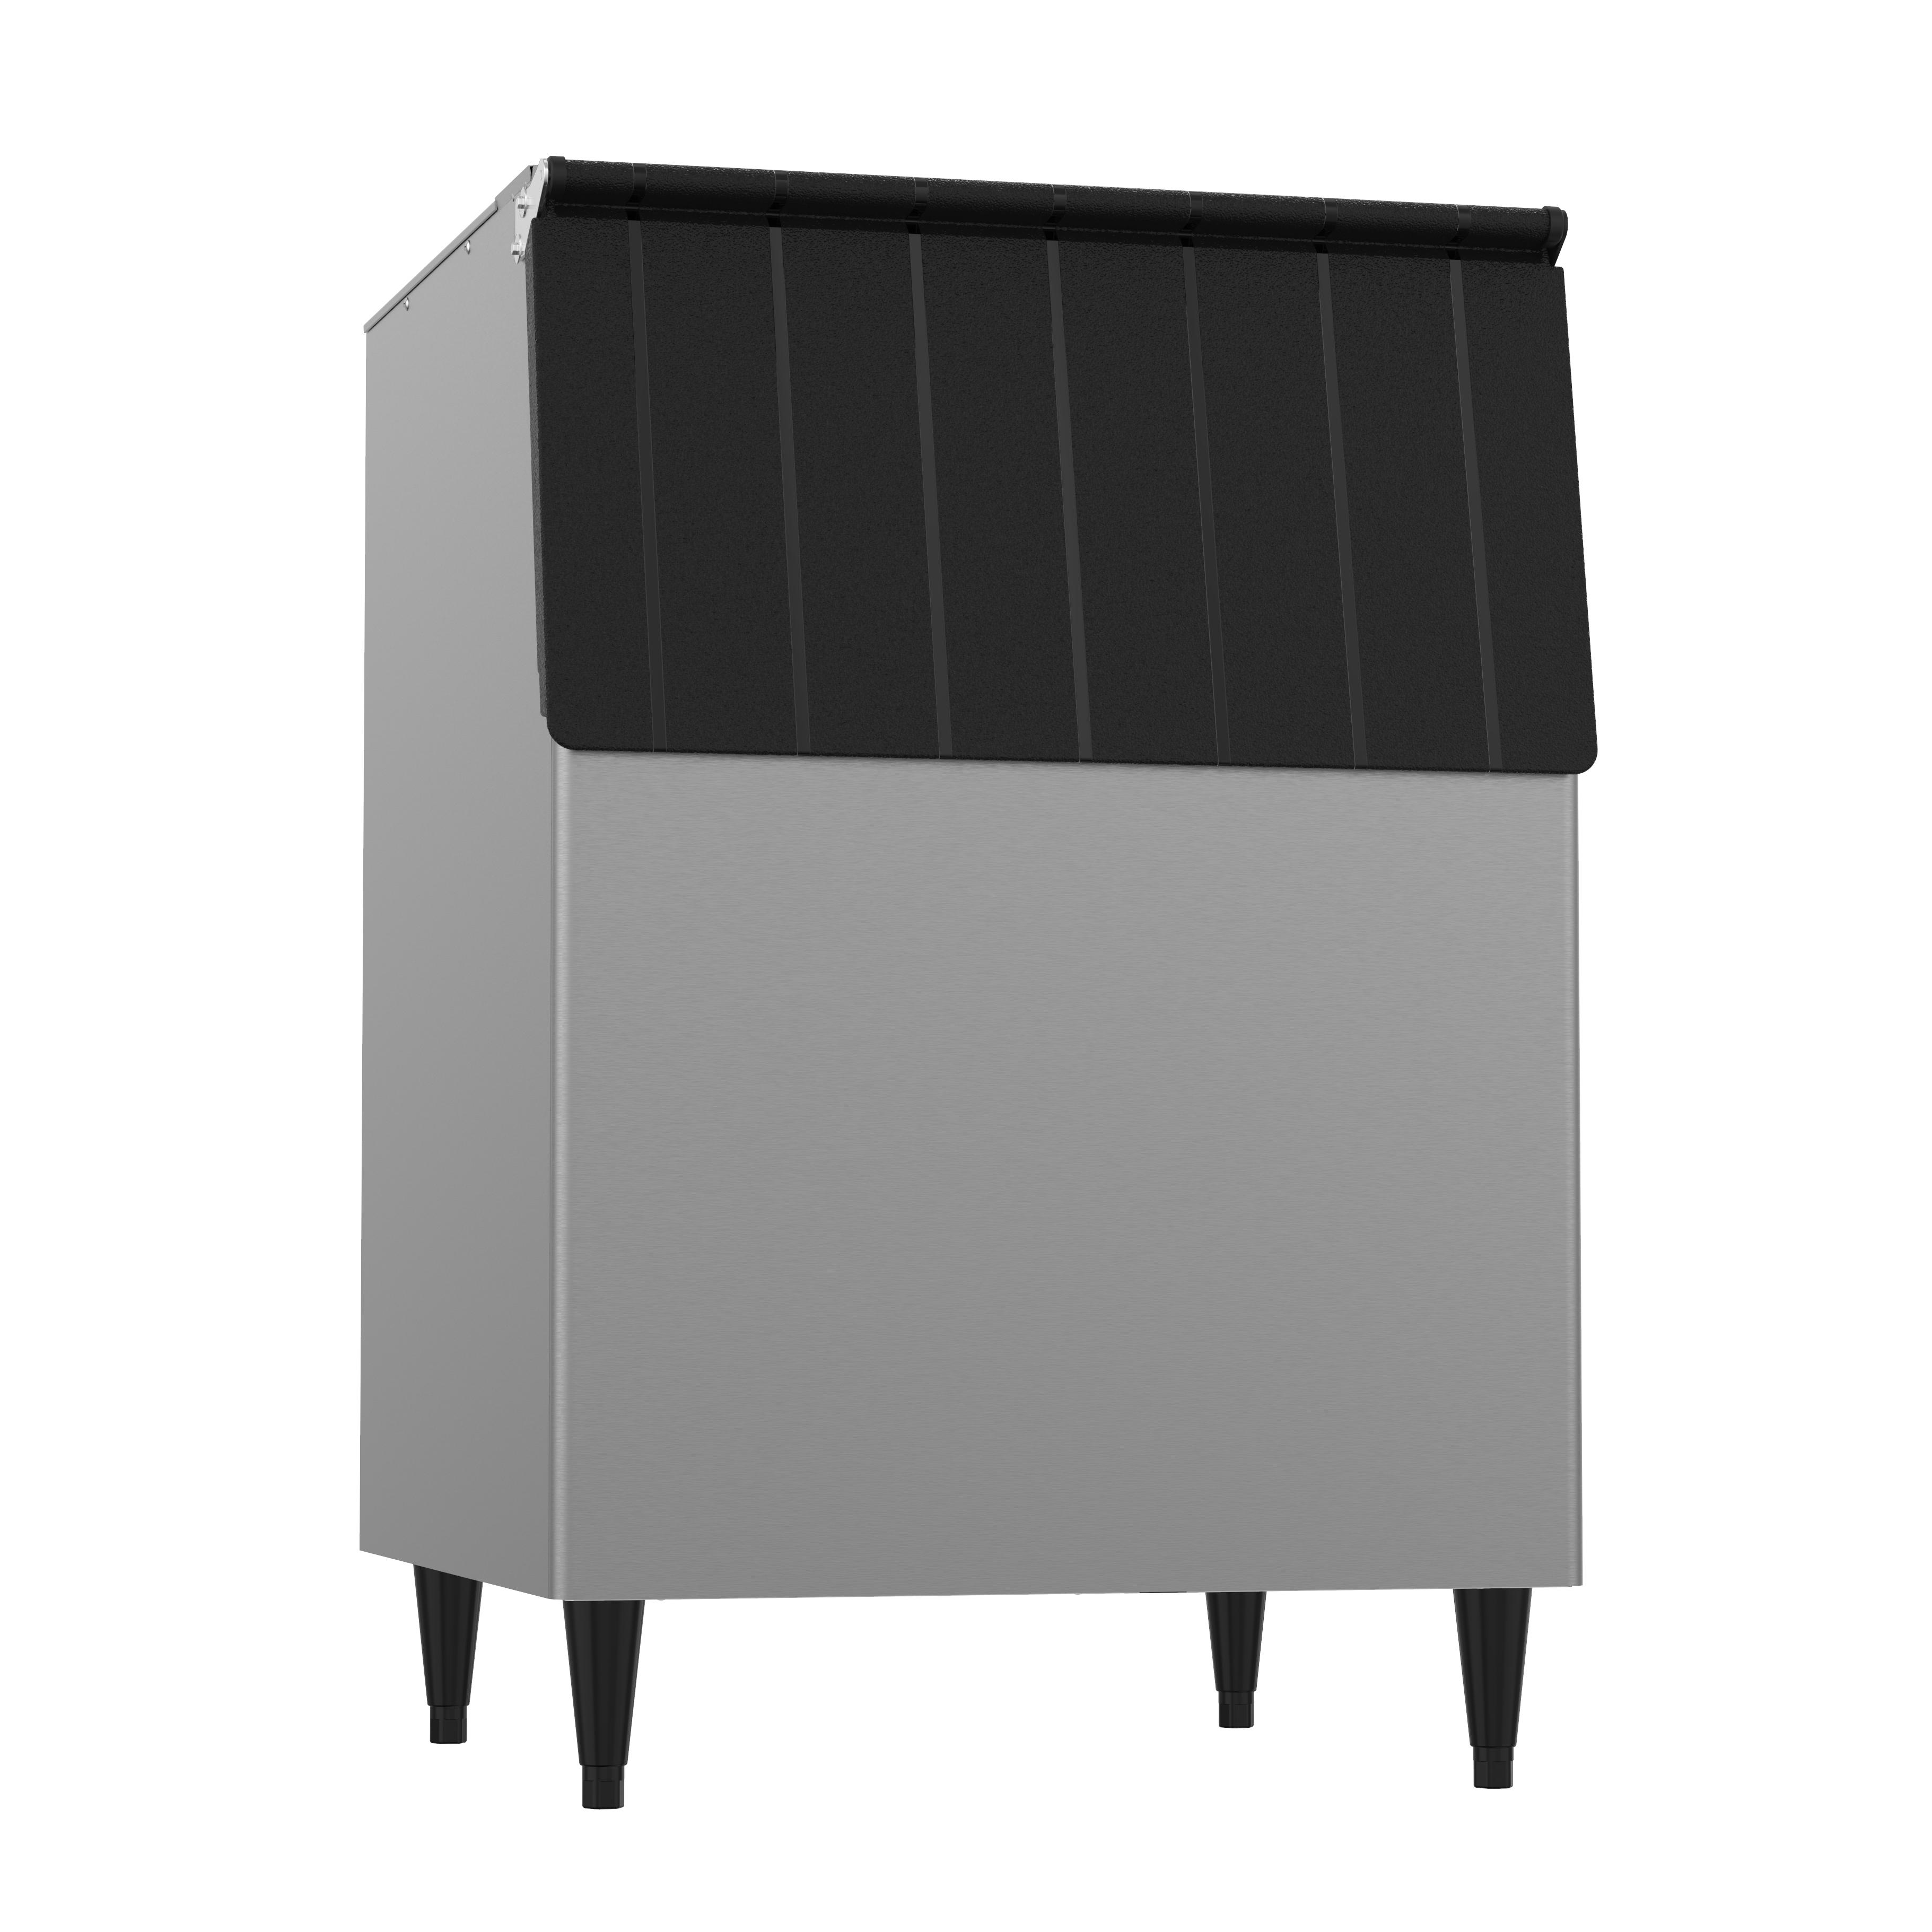 Hoshizaki BD-500PF ice cubers, ice storage & ice dispensers